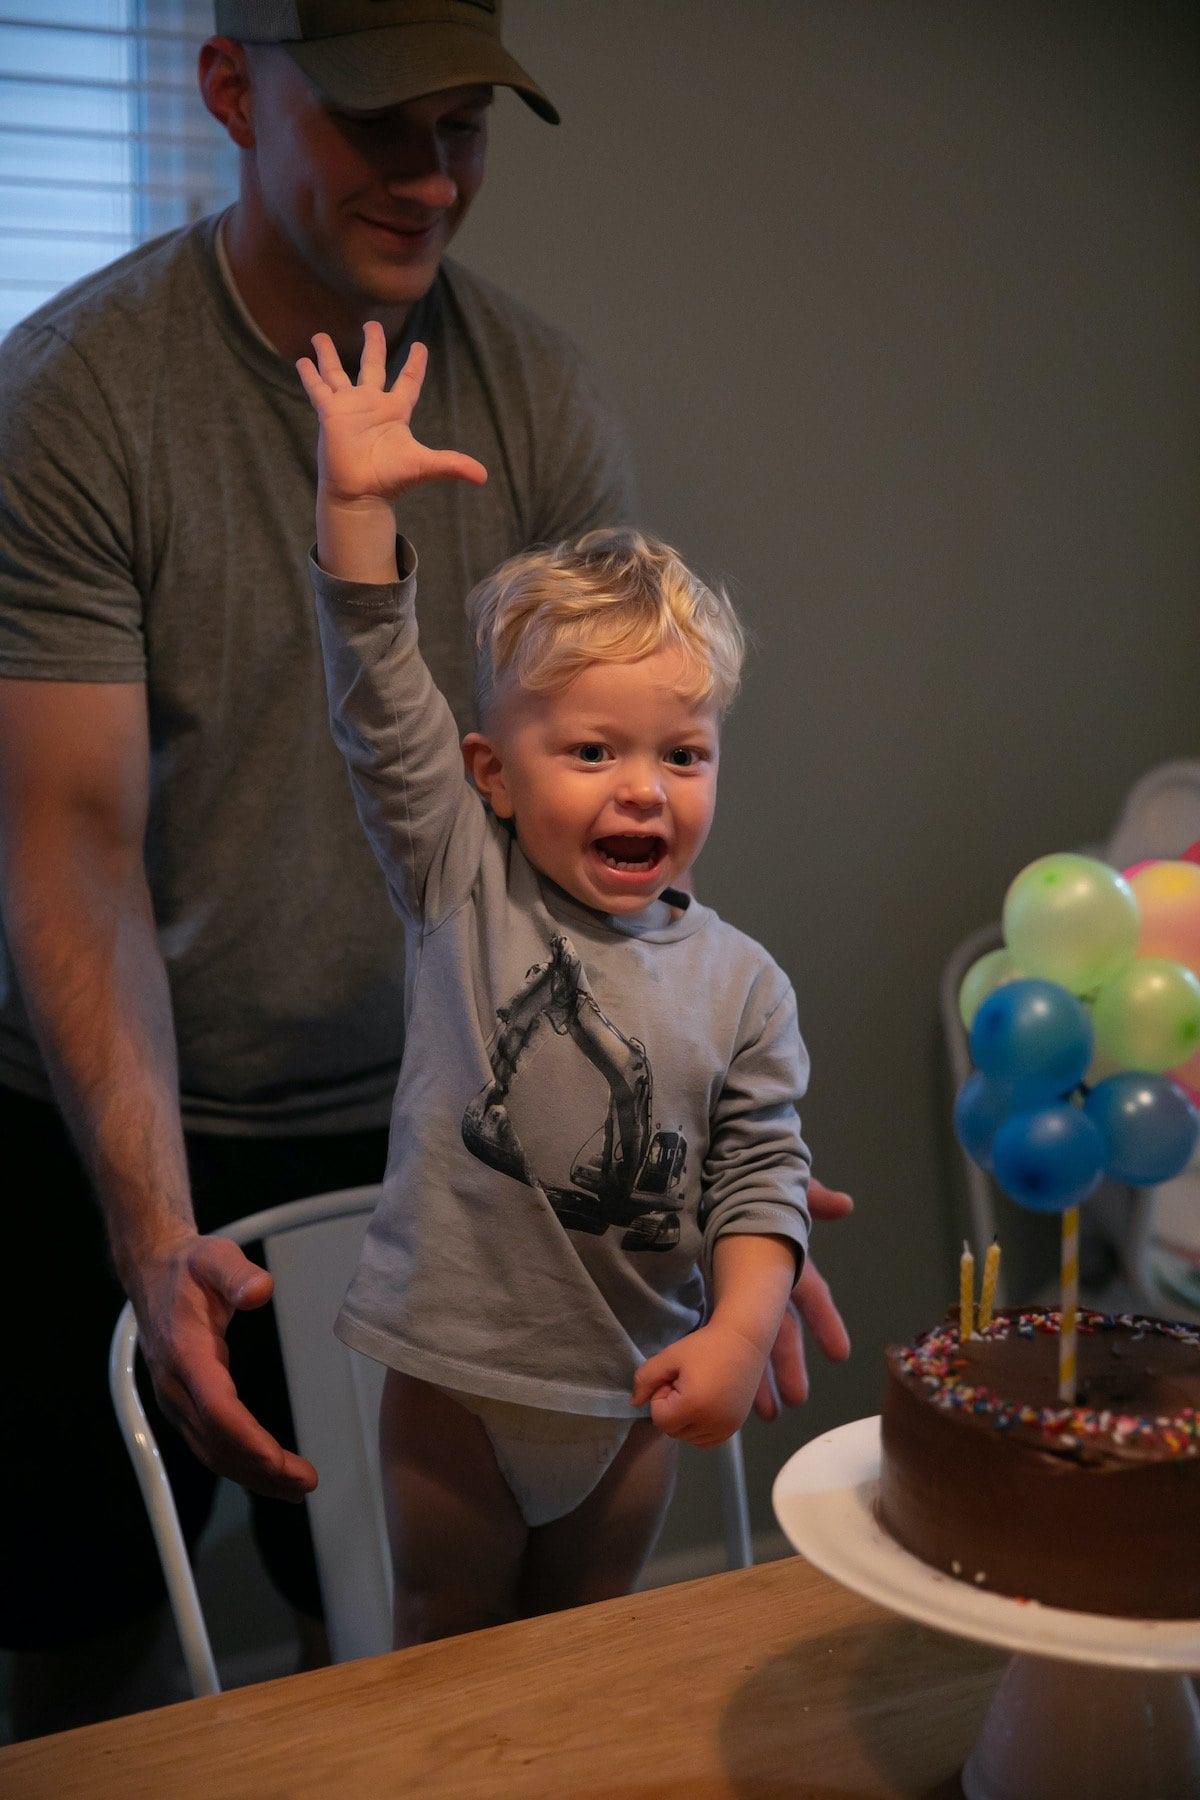 baby raising his hand in front of birthday cake